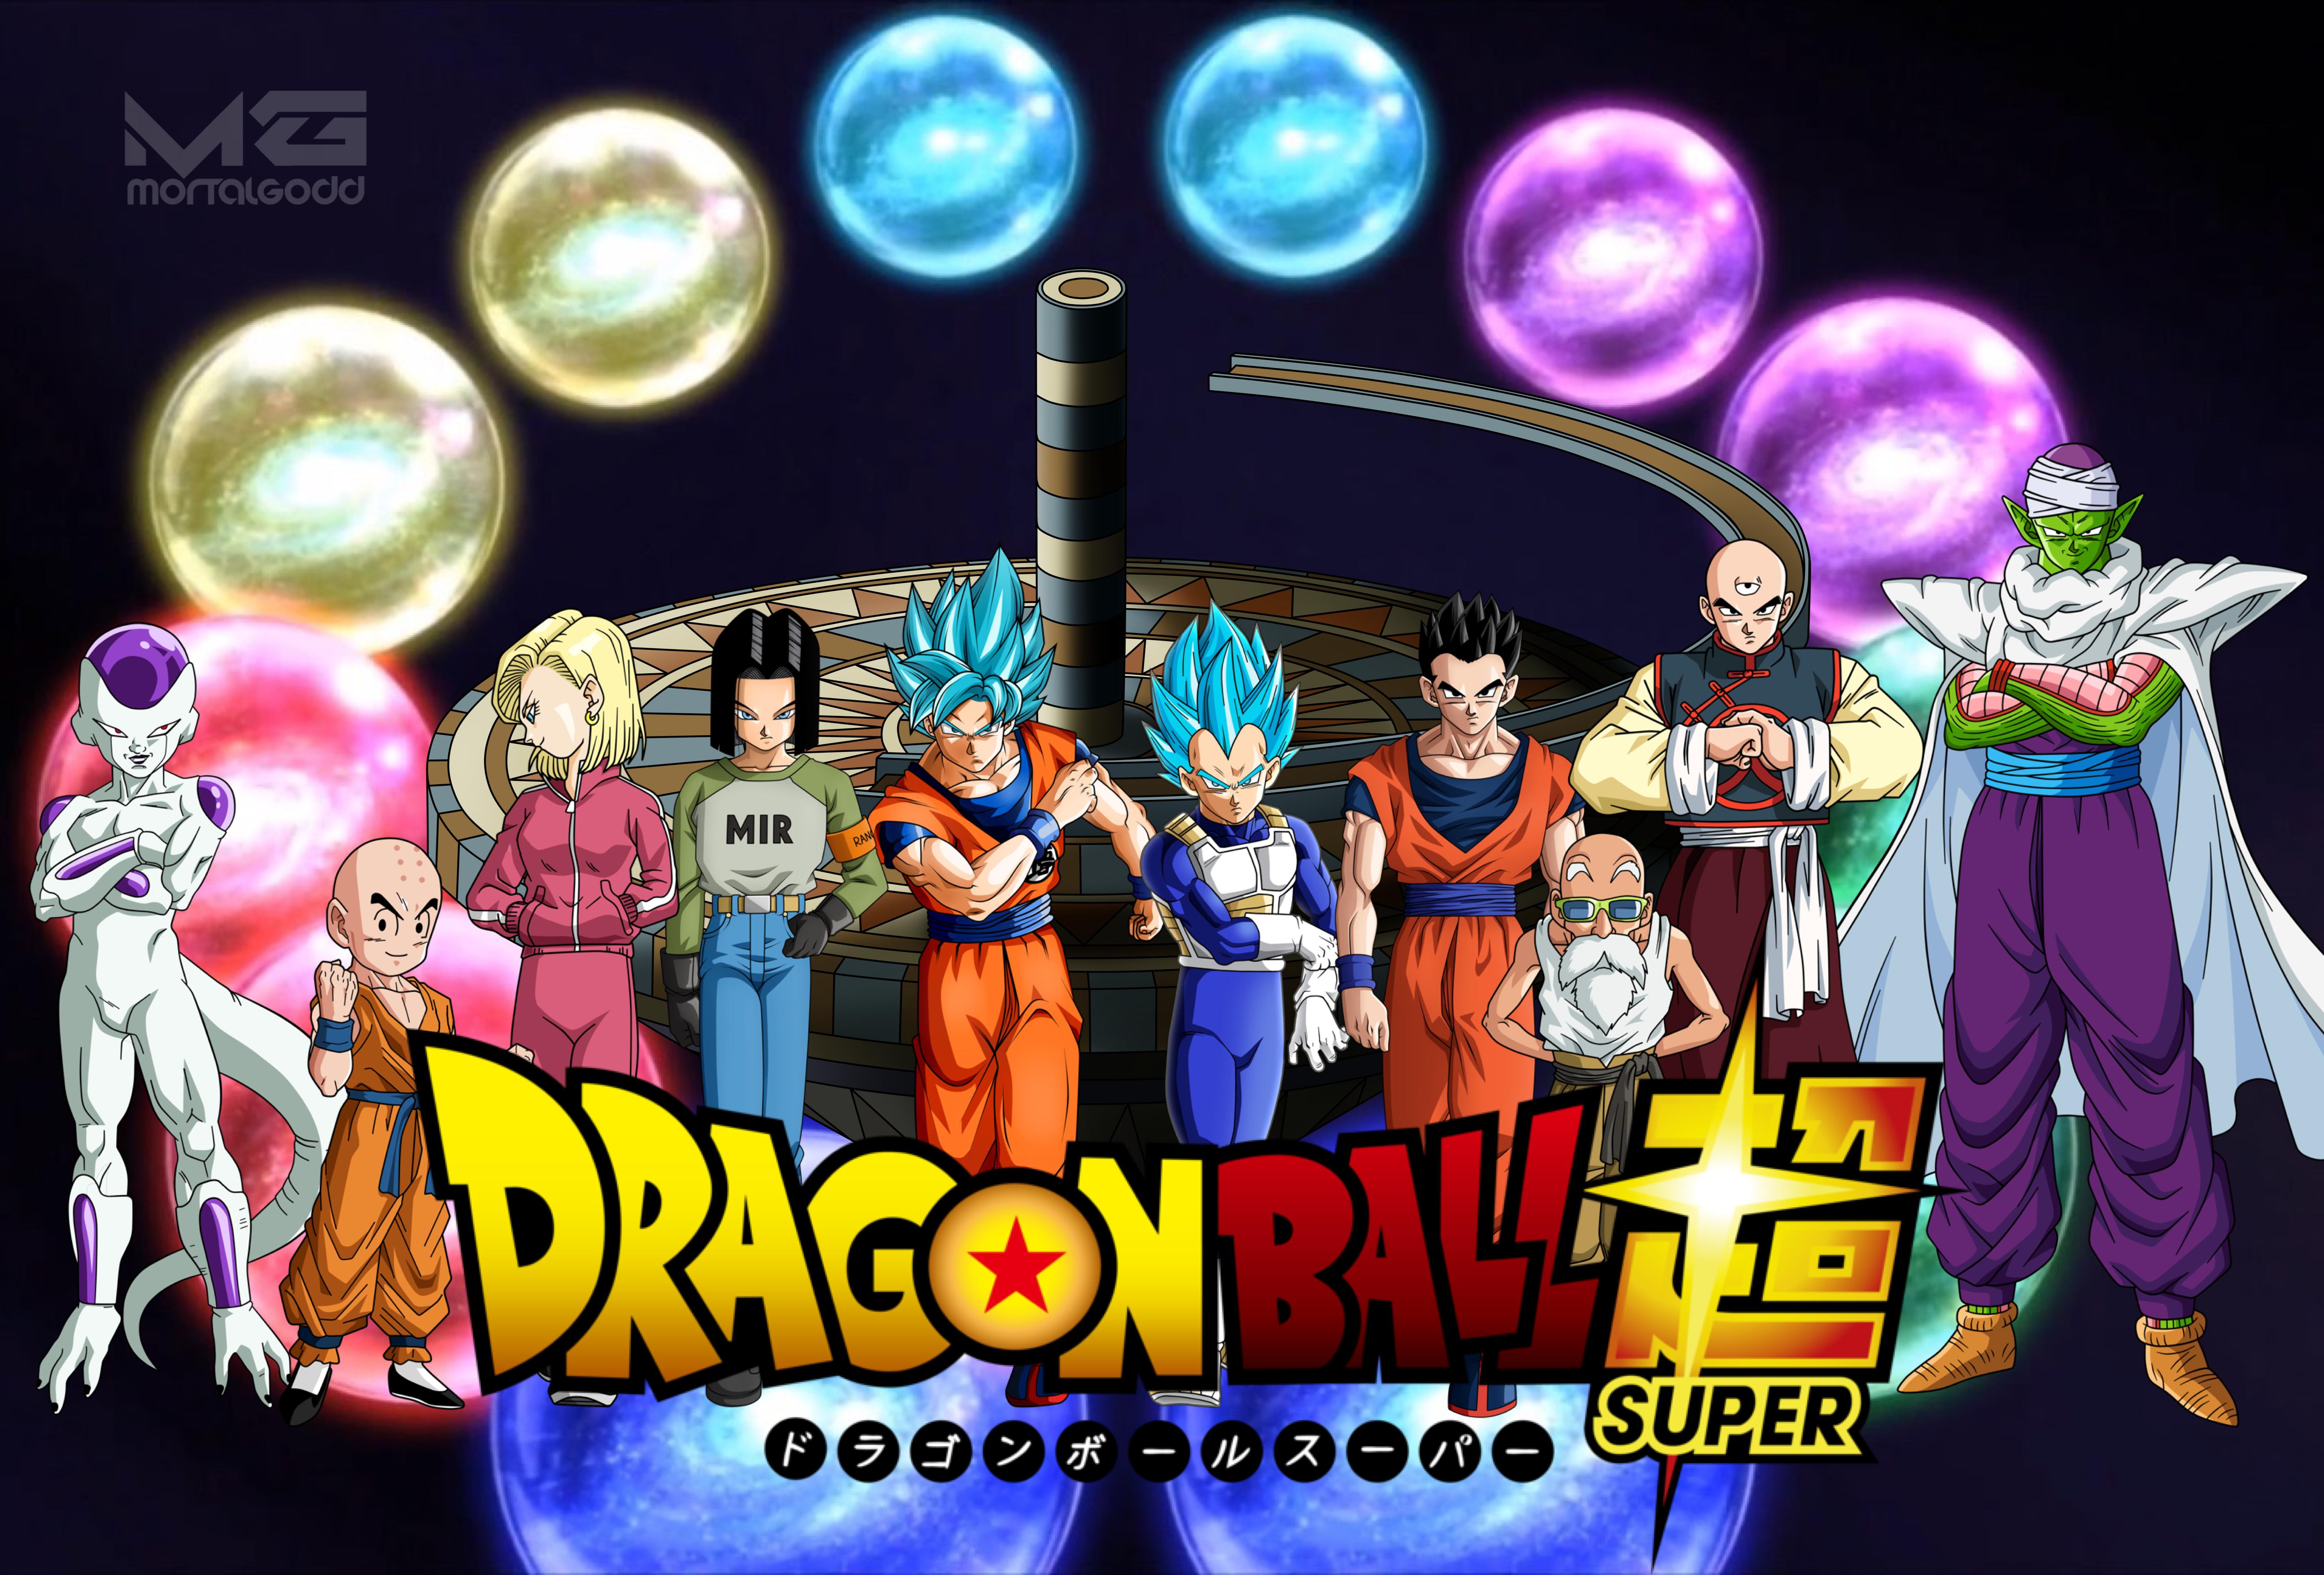 Dragon Ball Super Universe 7 New Team Wallpaper By Mortalgodd On